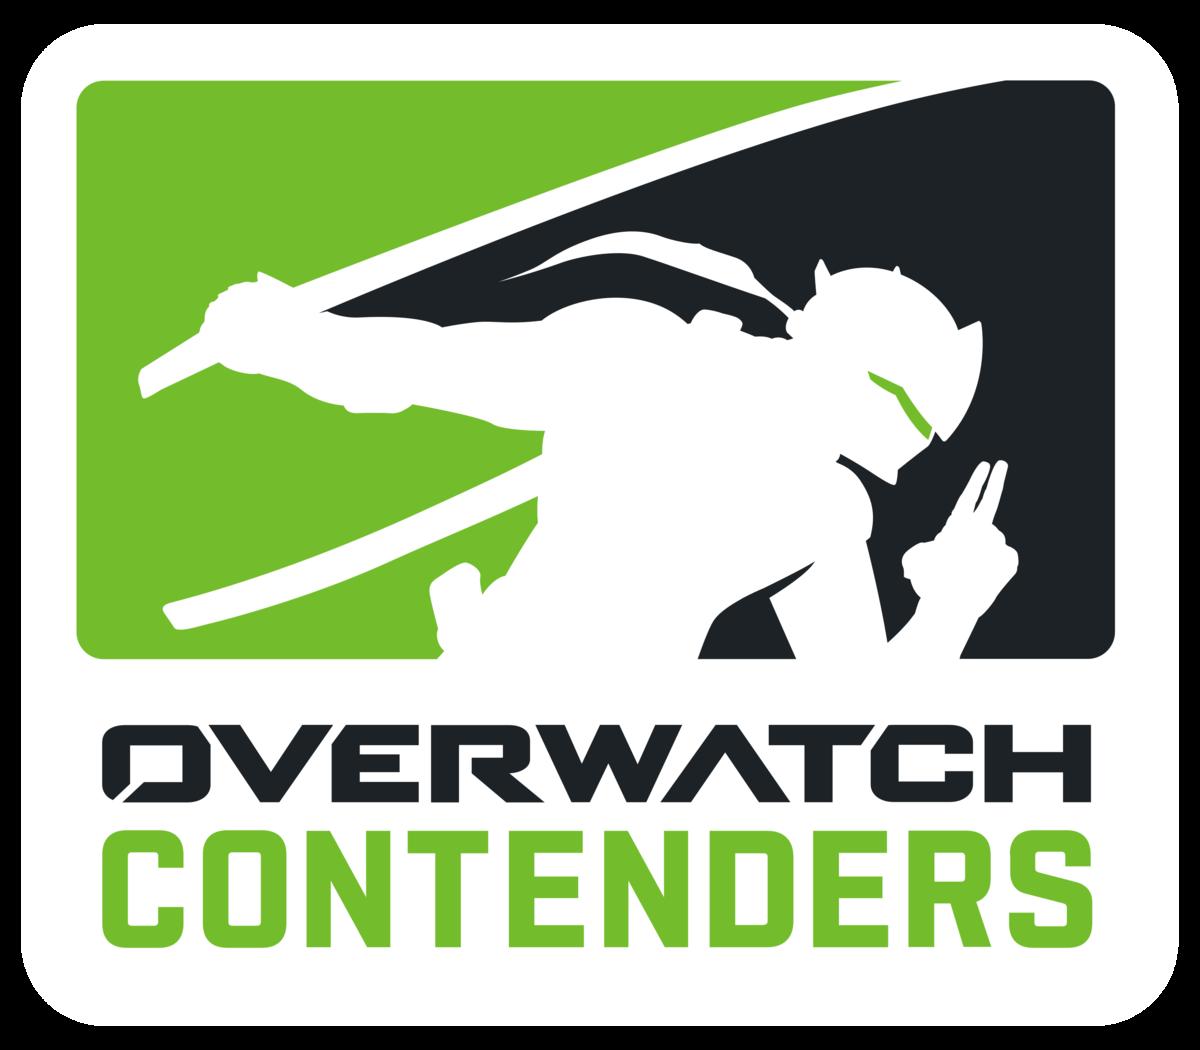 Overwatch Contenders 2018 Season 2 - Pacific